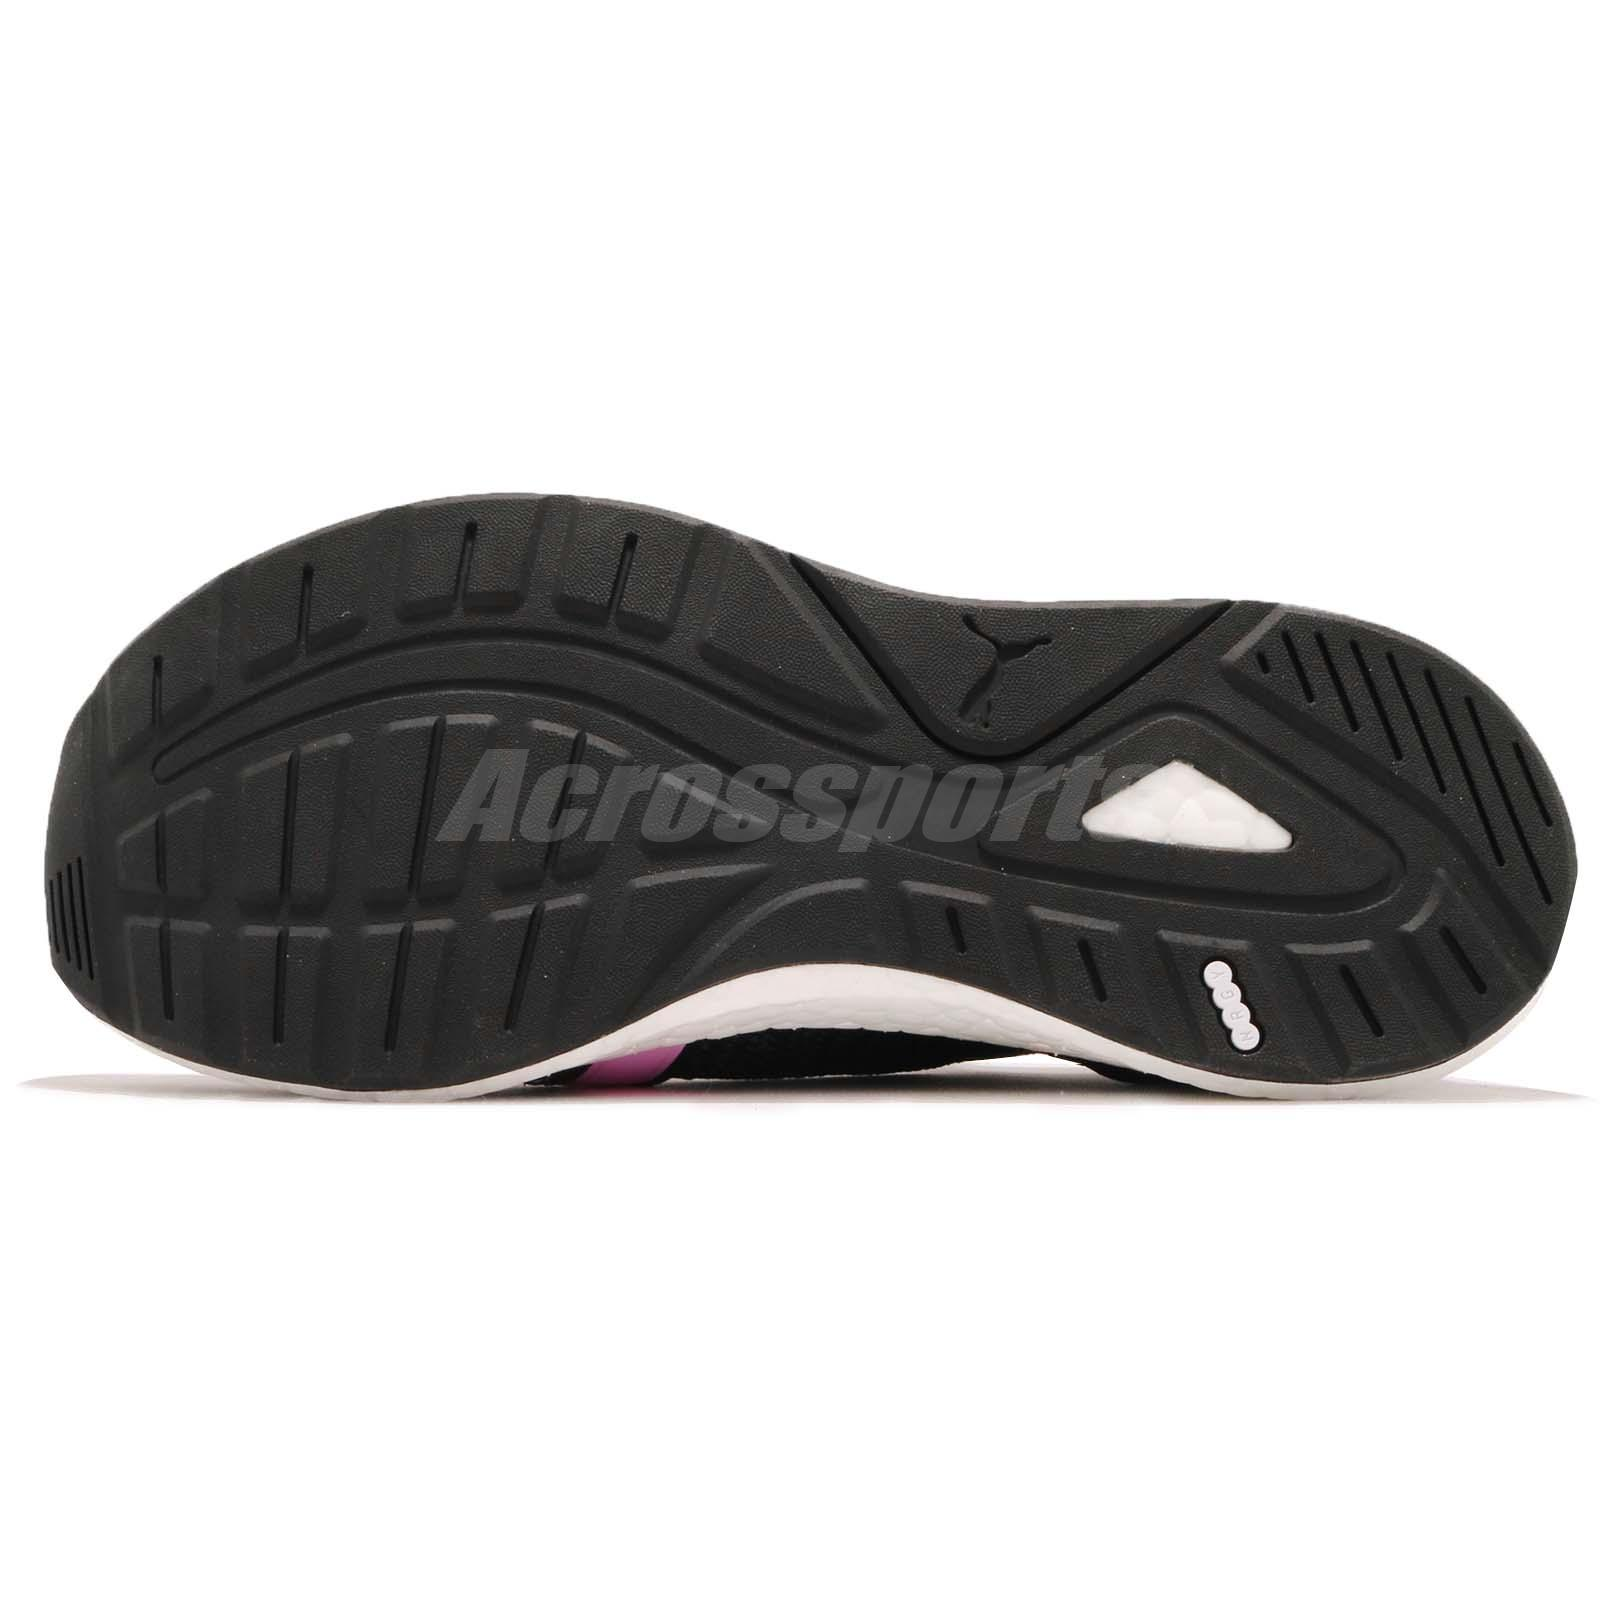 bae2e28f0ff Puma NRGY Neko Engineer Knit Wns Black Orchid Women Running Shoes ...